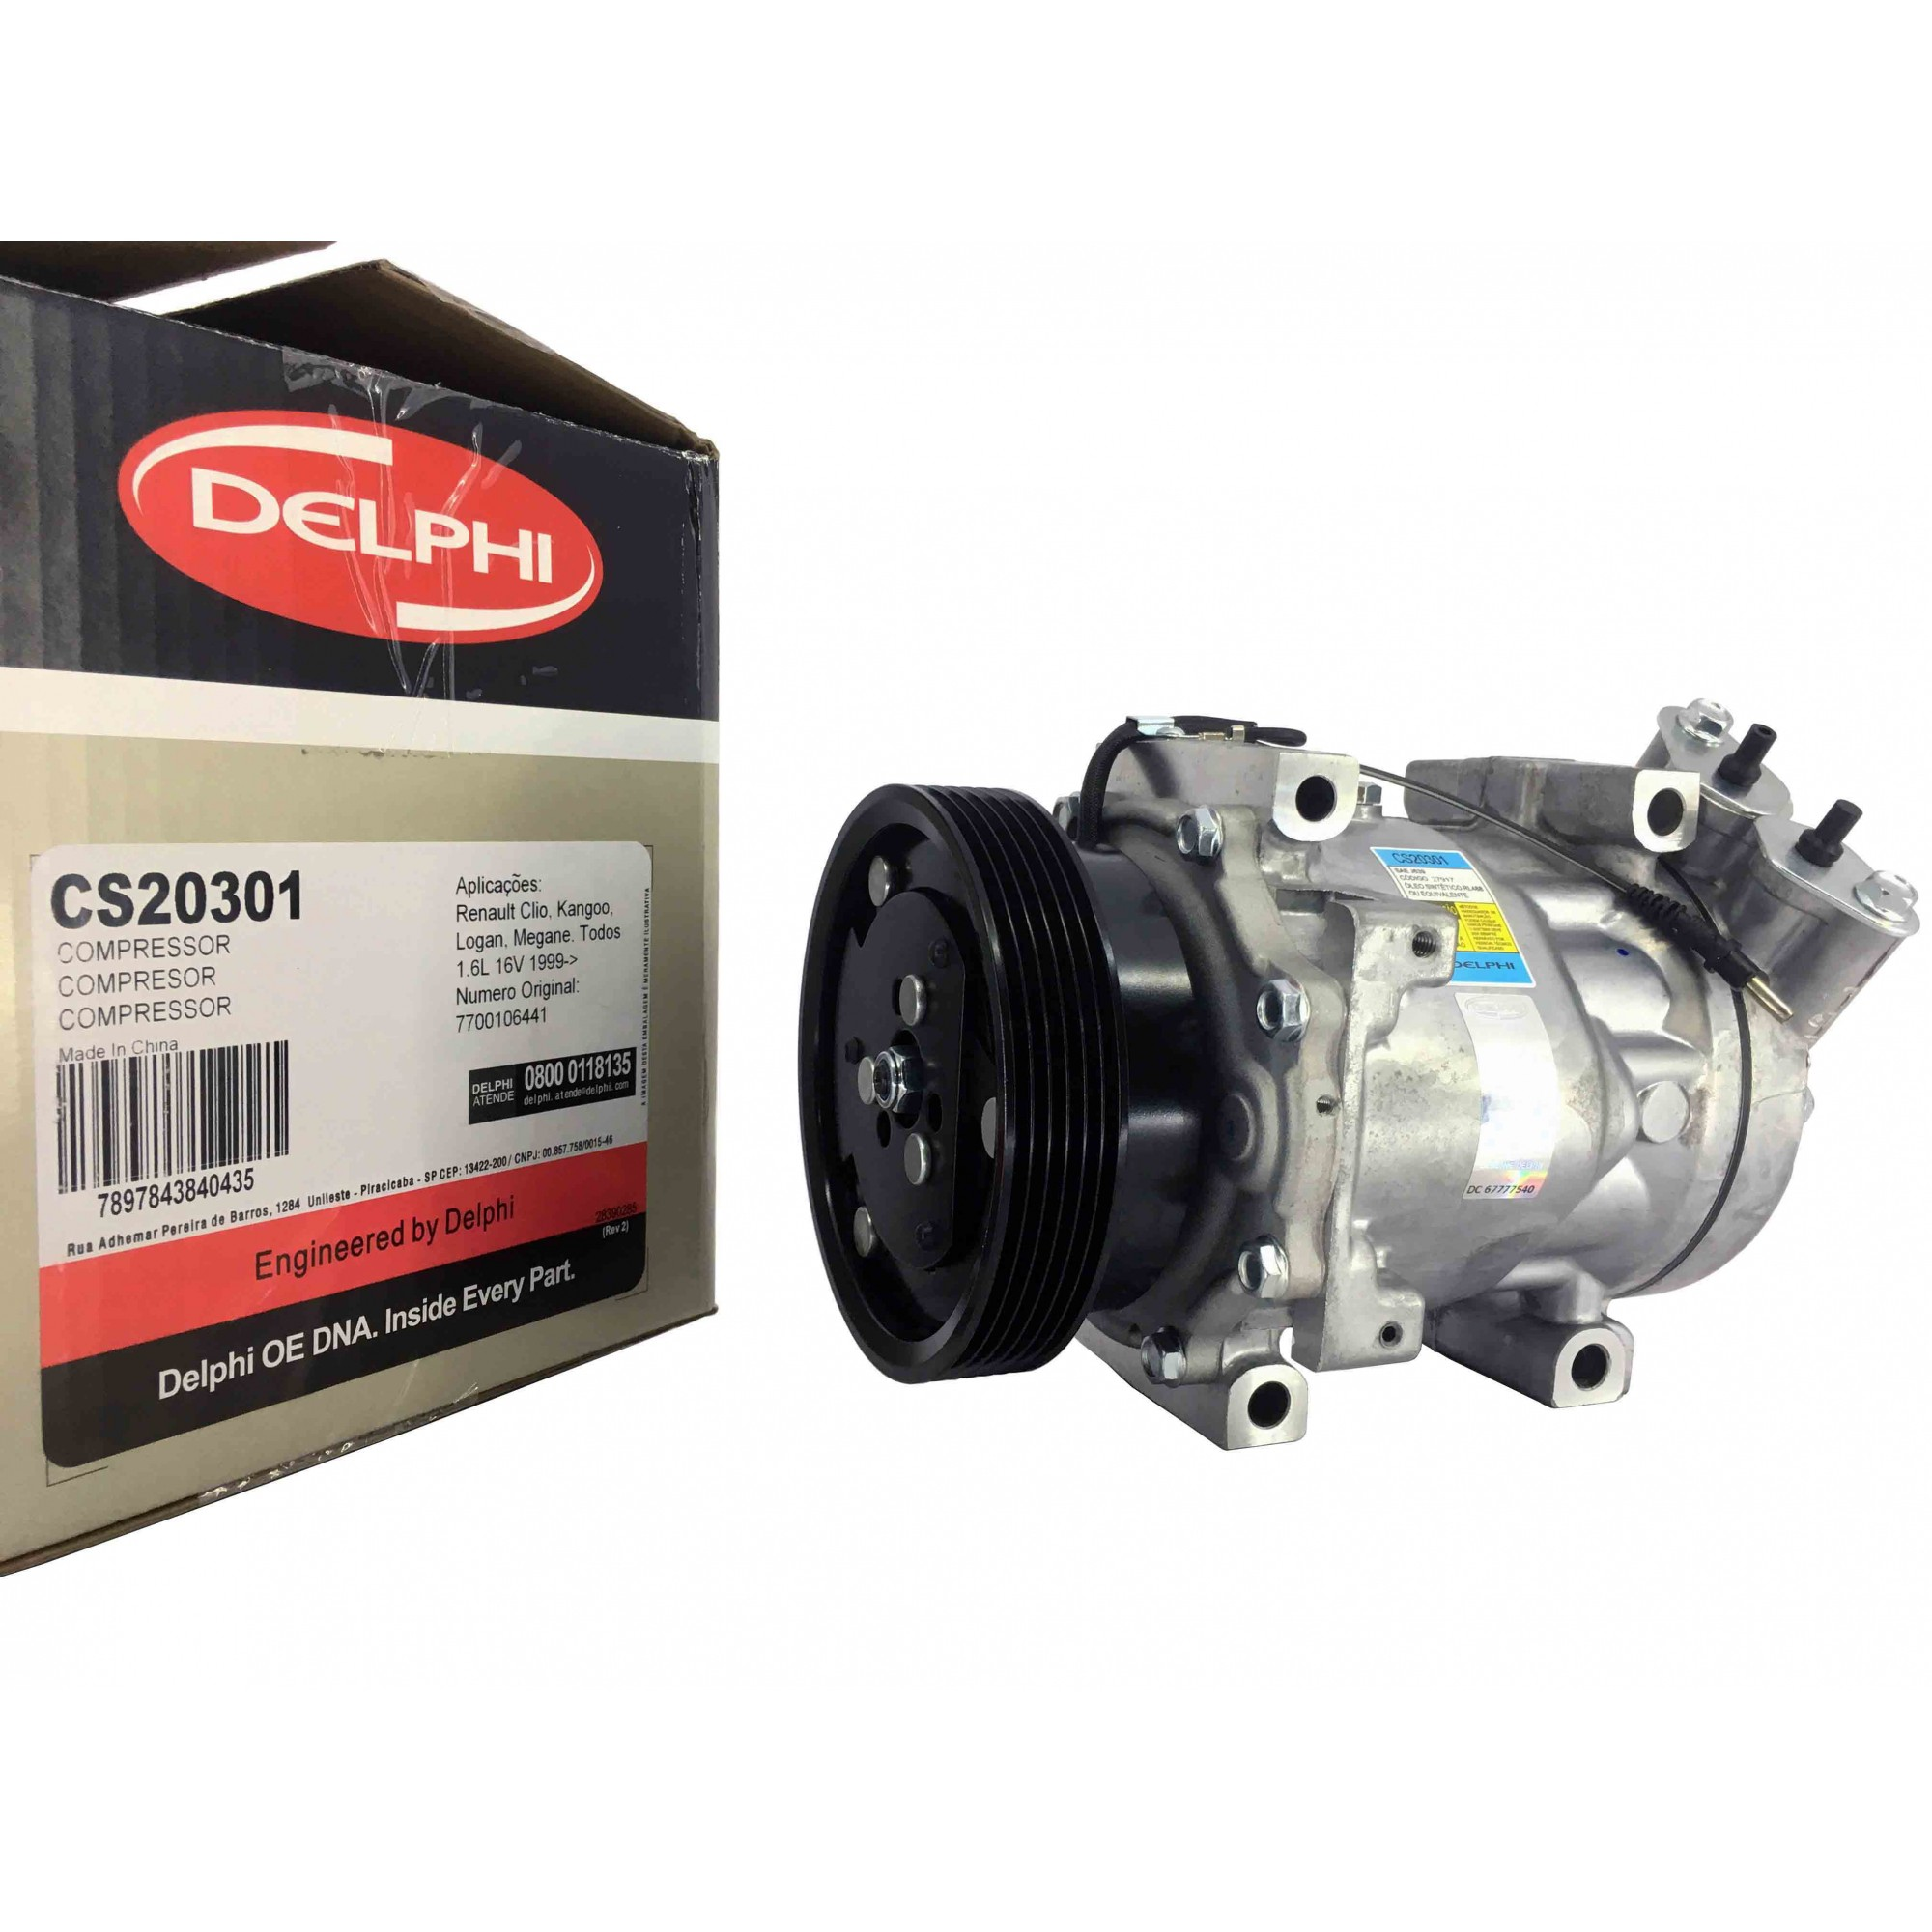 Compressor Sandero / Clio / Logan / Duster 1.6 - Original DELPHI